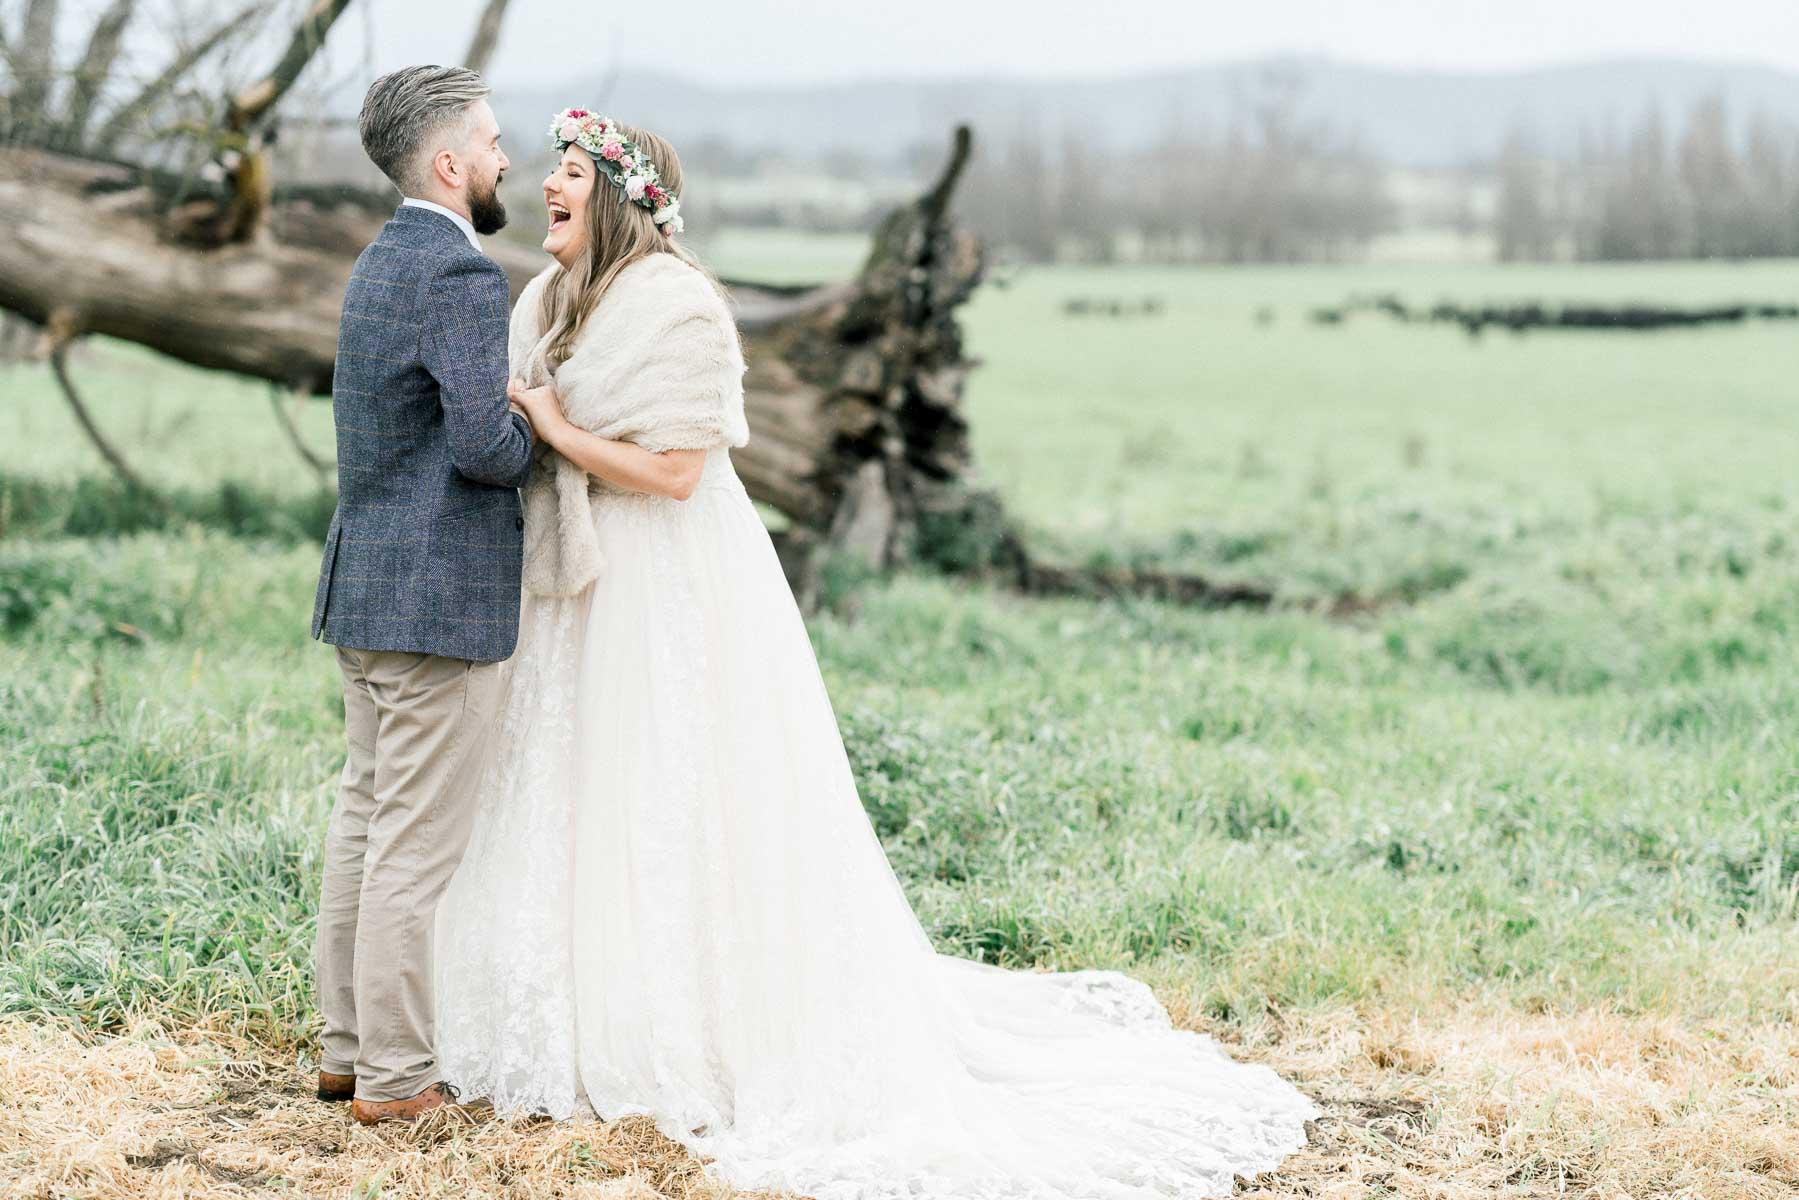 adams-farm-coldstream-yarra-valley-wedding-heart+soul-weddings-kel-jarryd-05626.jpg